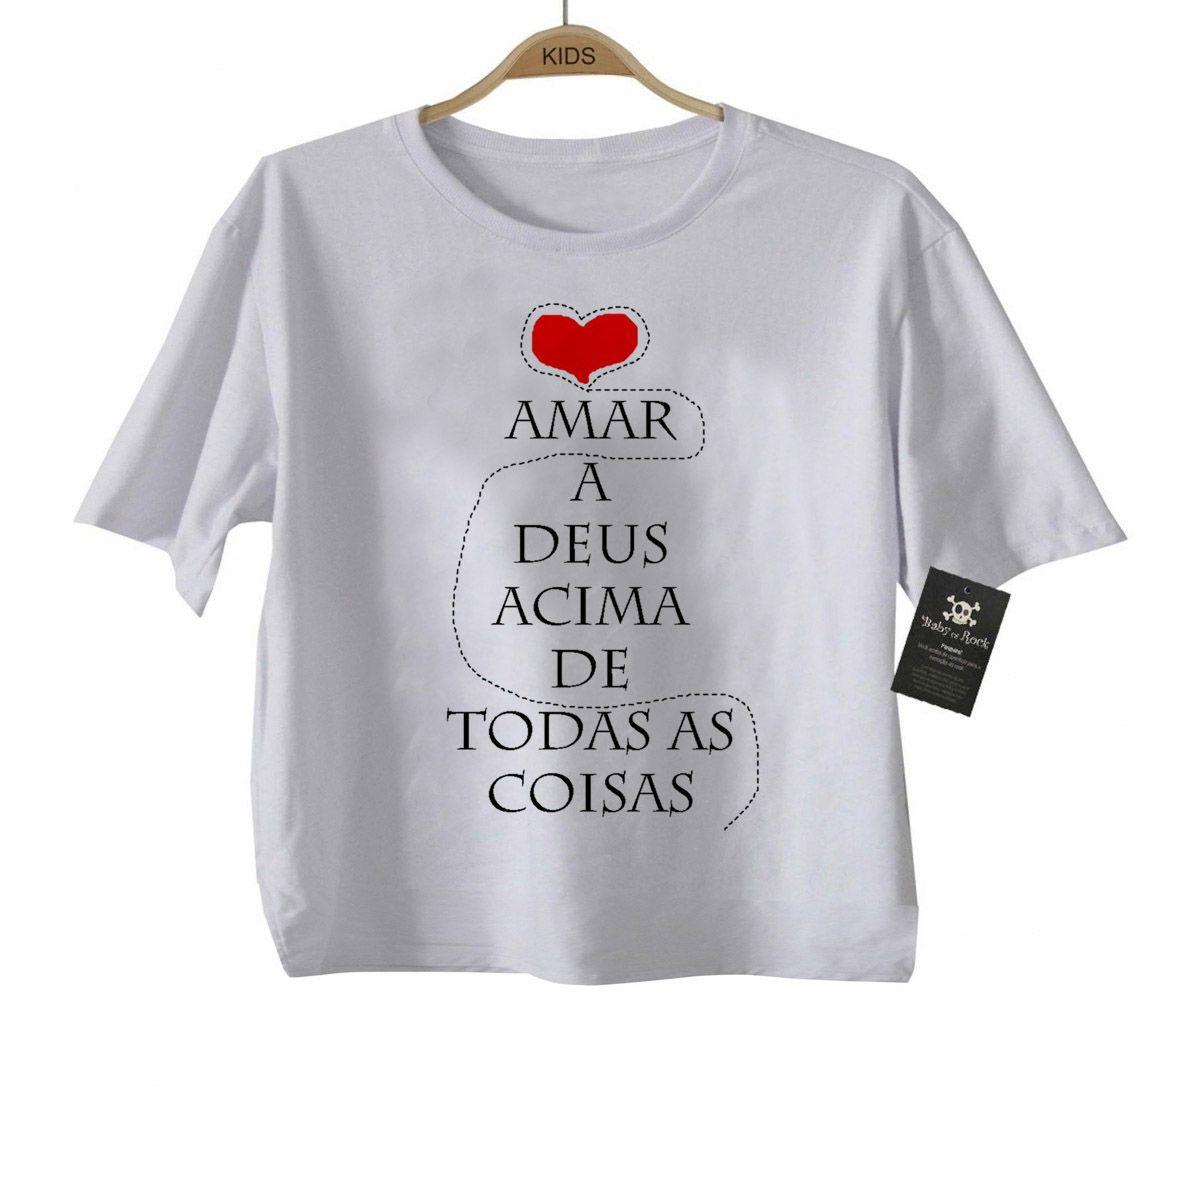 Camiseta Infantil  Amar a Deus Gospel - White  - Baby Monster S/A